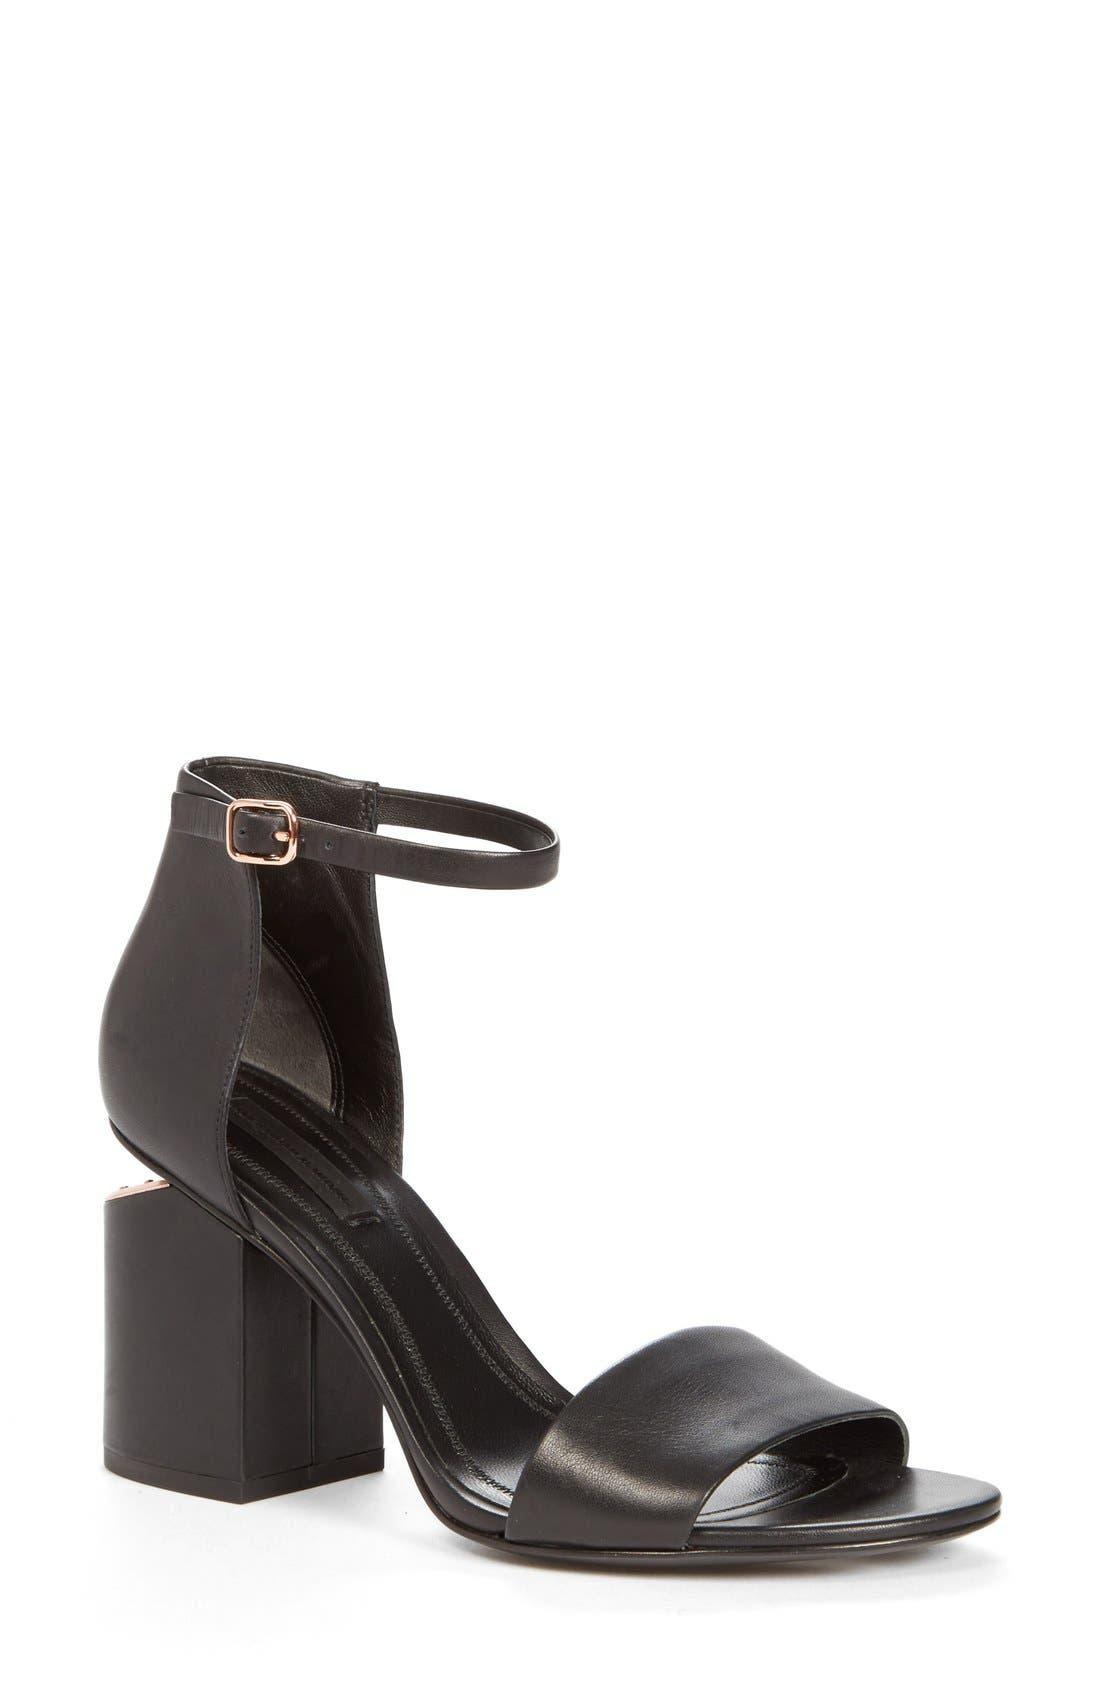 'Abby' Ankle Strap Sandal,                         Main,                         color, BLACK/ ROSE GOLD